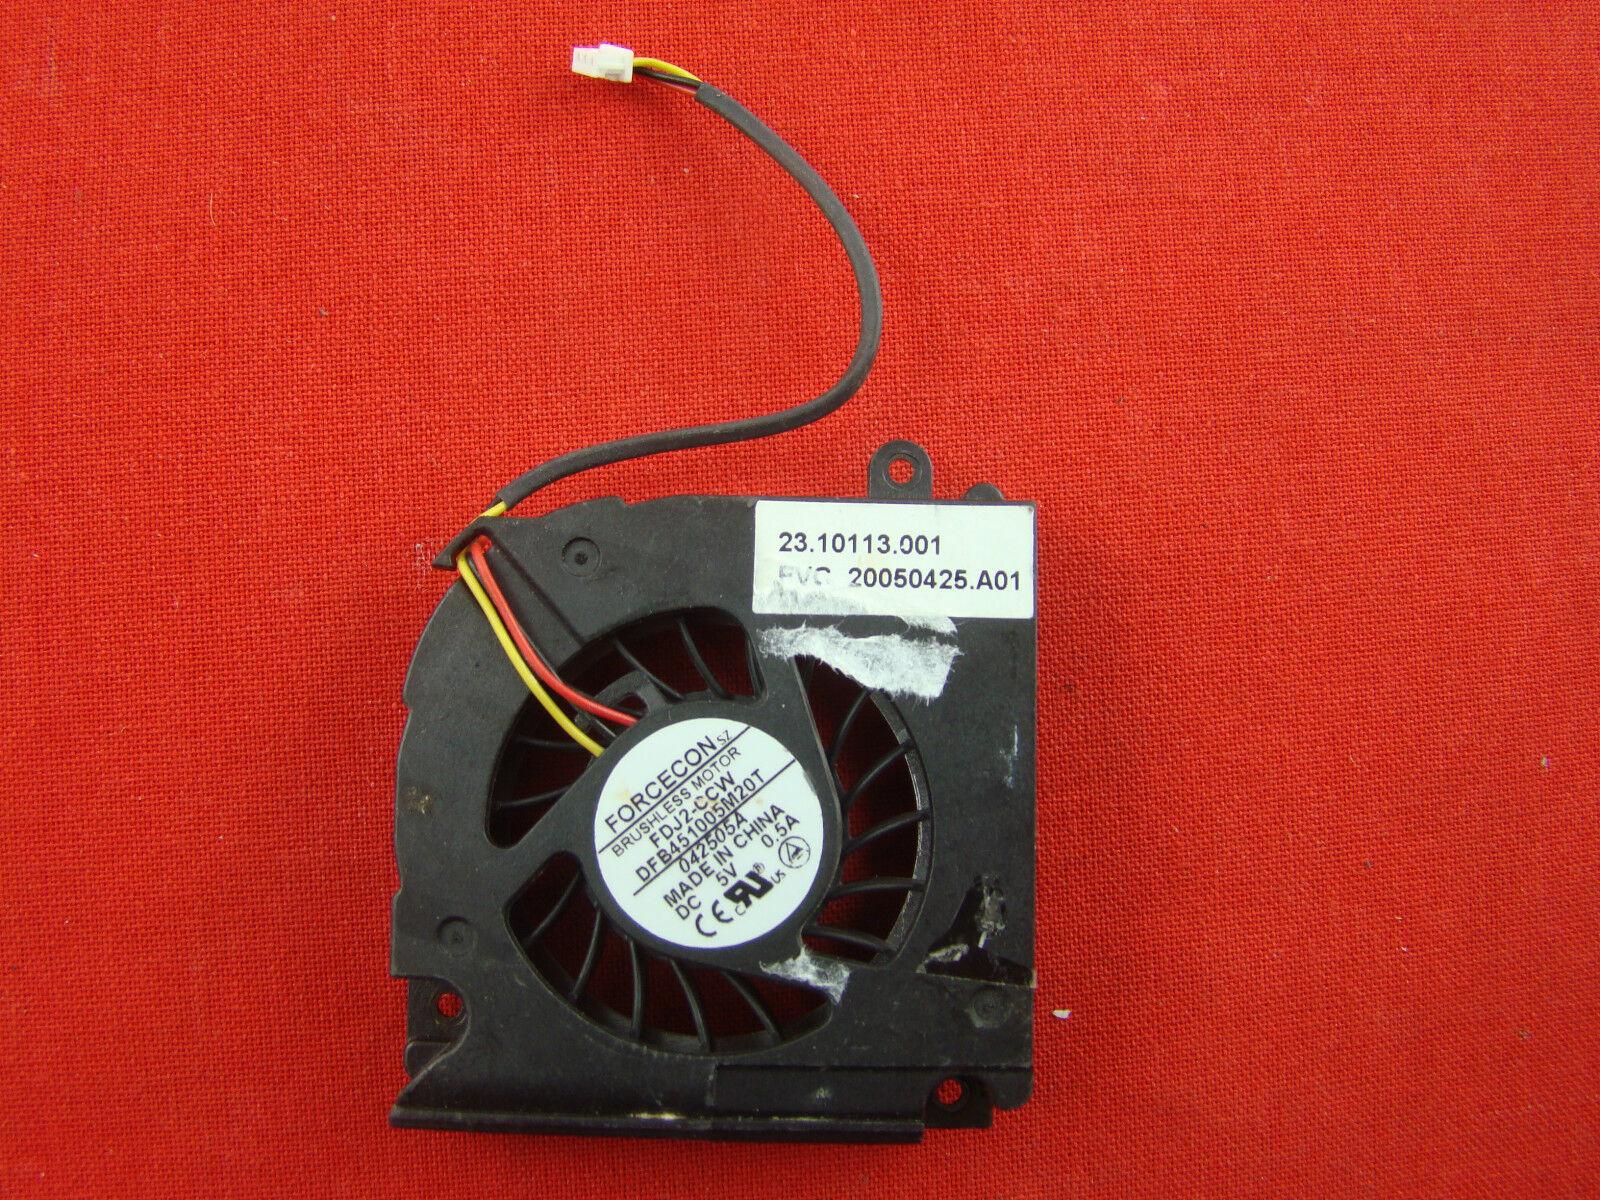 Cooling Fan Forcecon DFB451005M20T FDJ2-CCW 042505A #KZ-3114